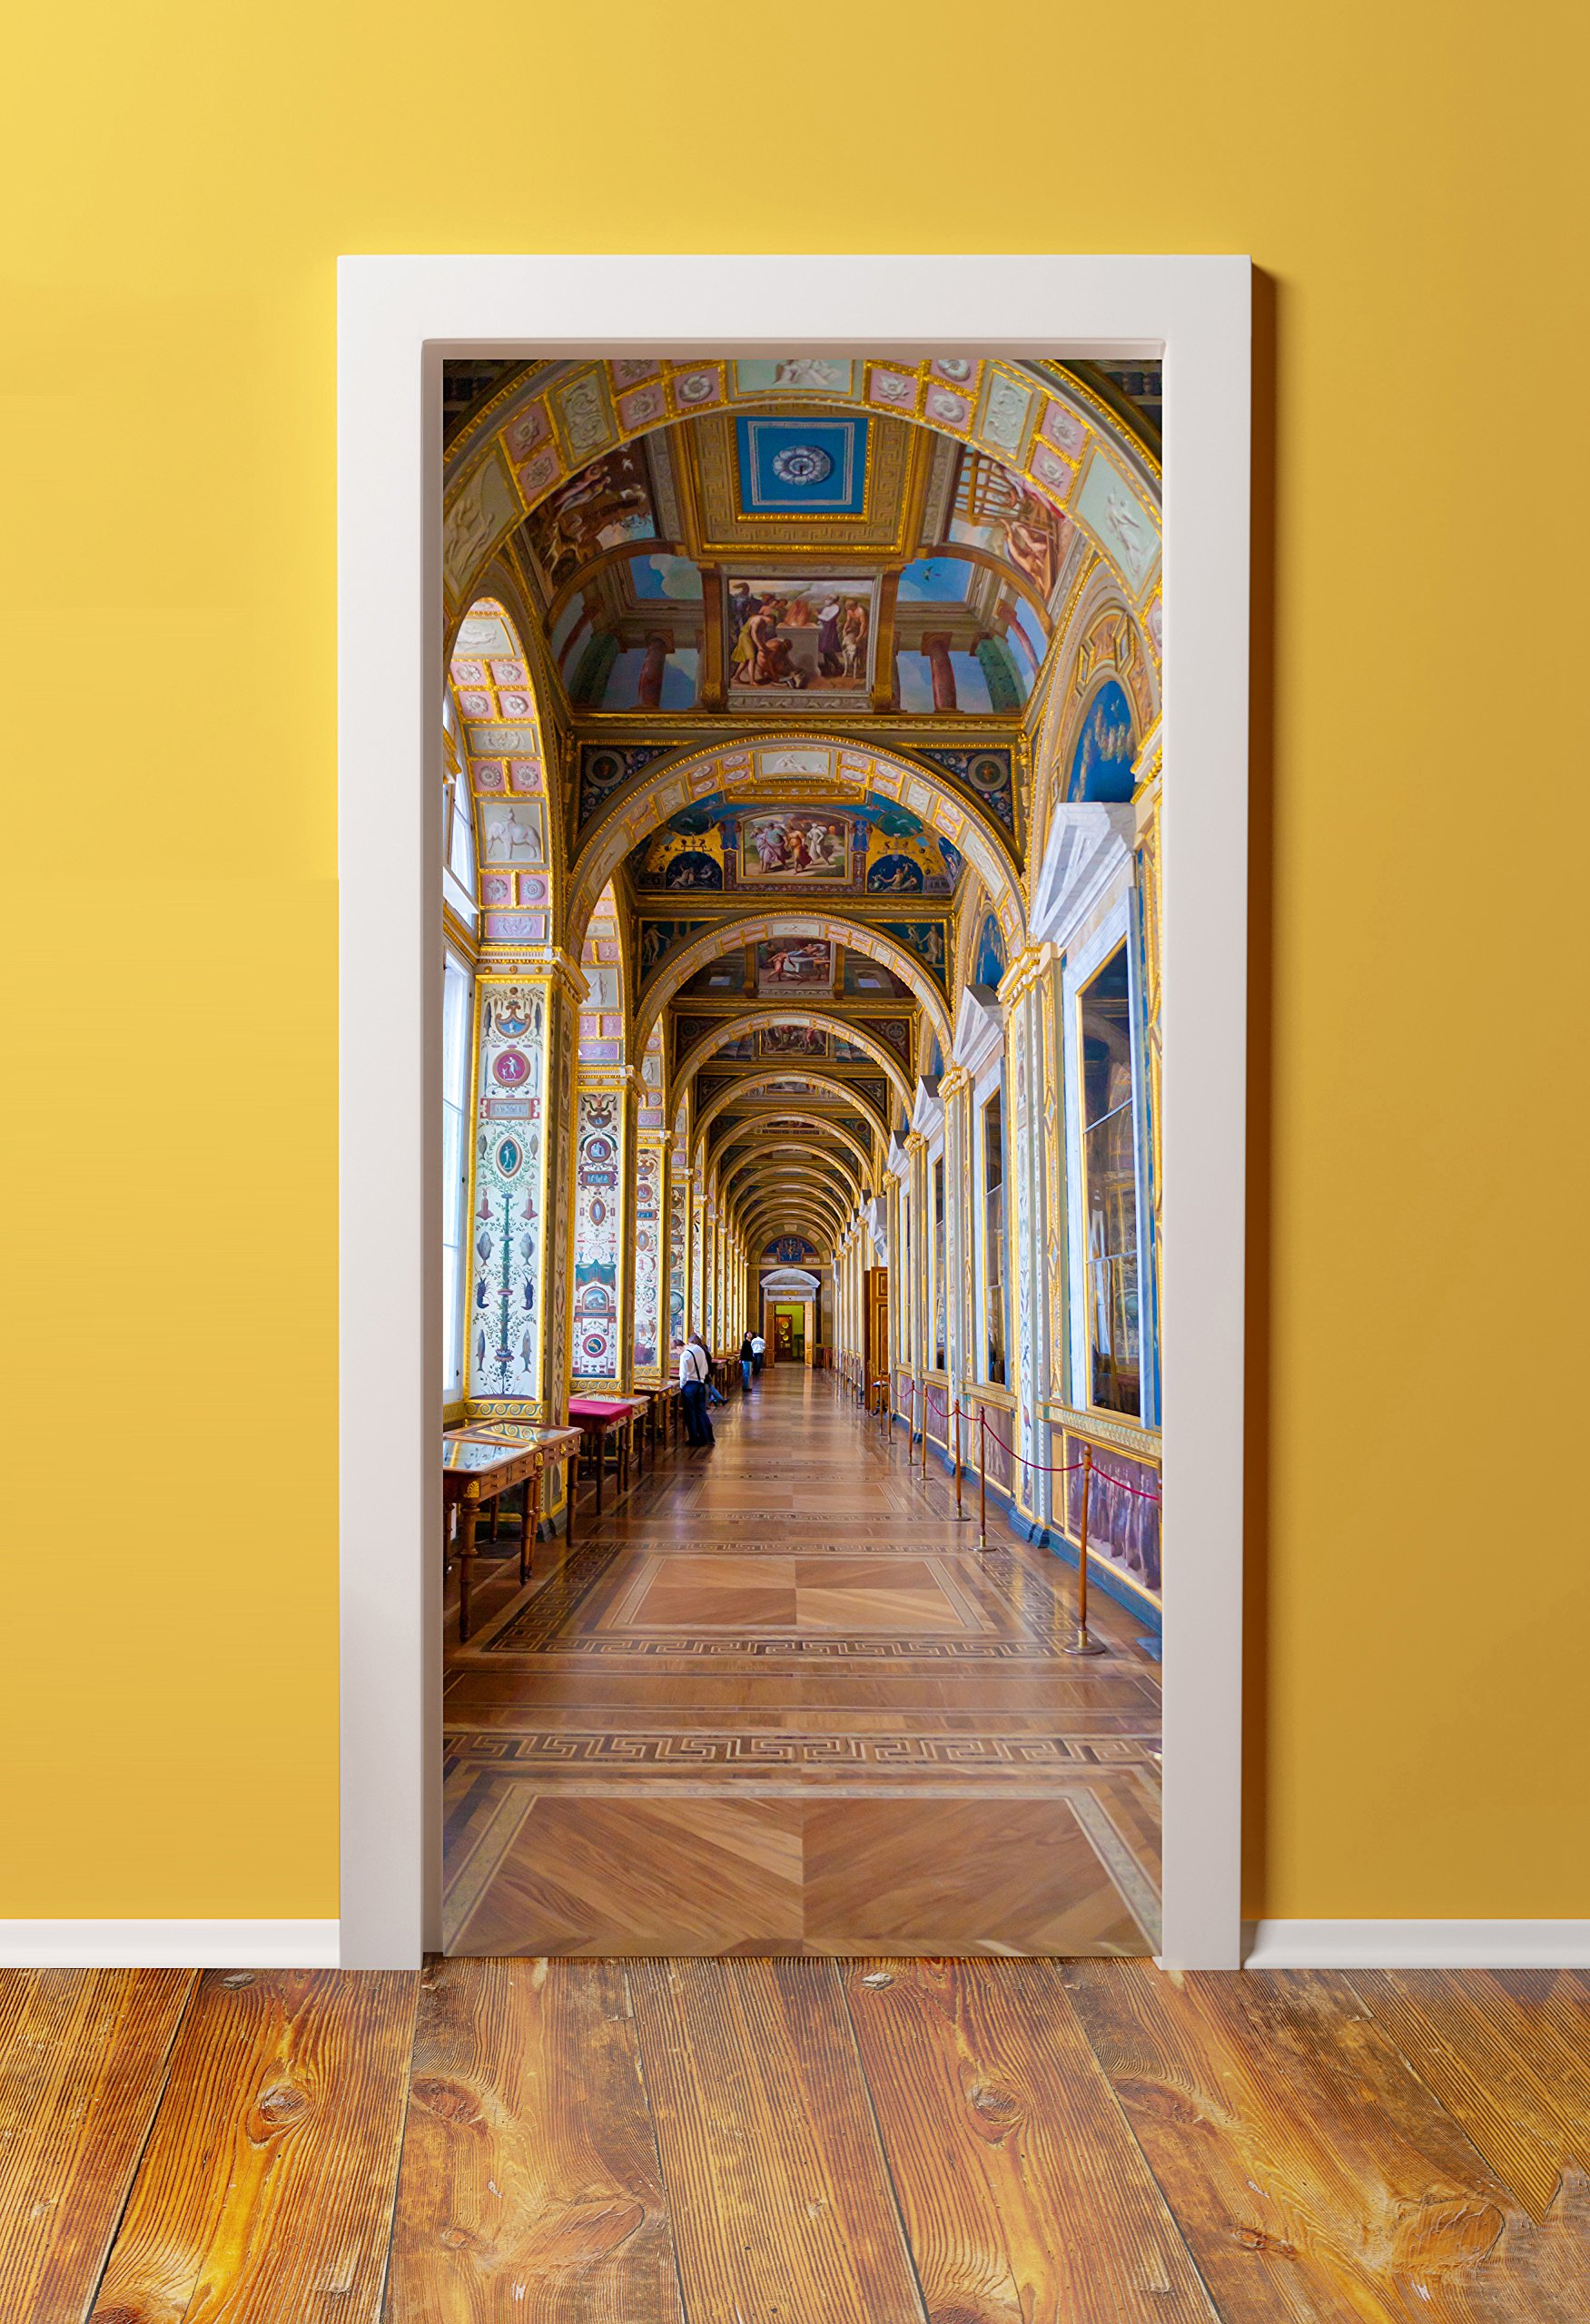 WindowPix 36x80 3D Door (Sticker) Murals - PEEL & STICK - Made from tear-proof, washable, durable material Versailles Castle Hallway Interior